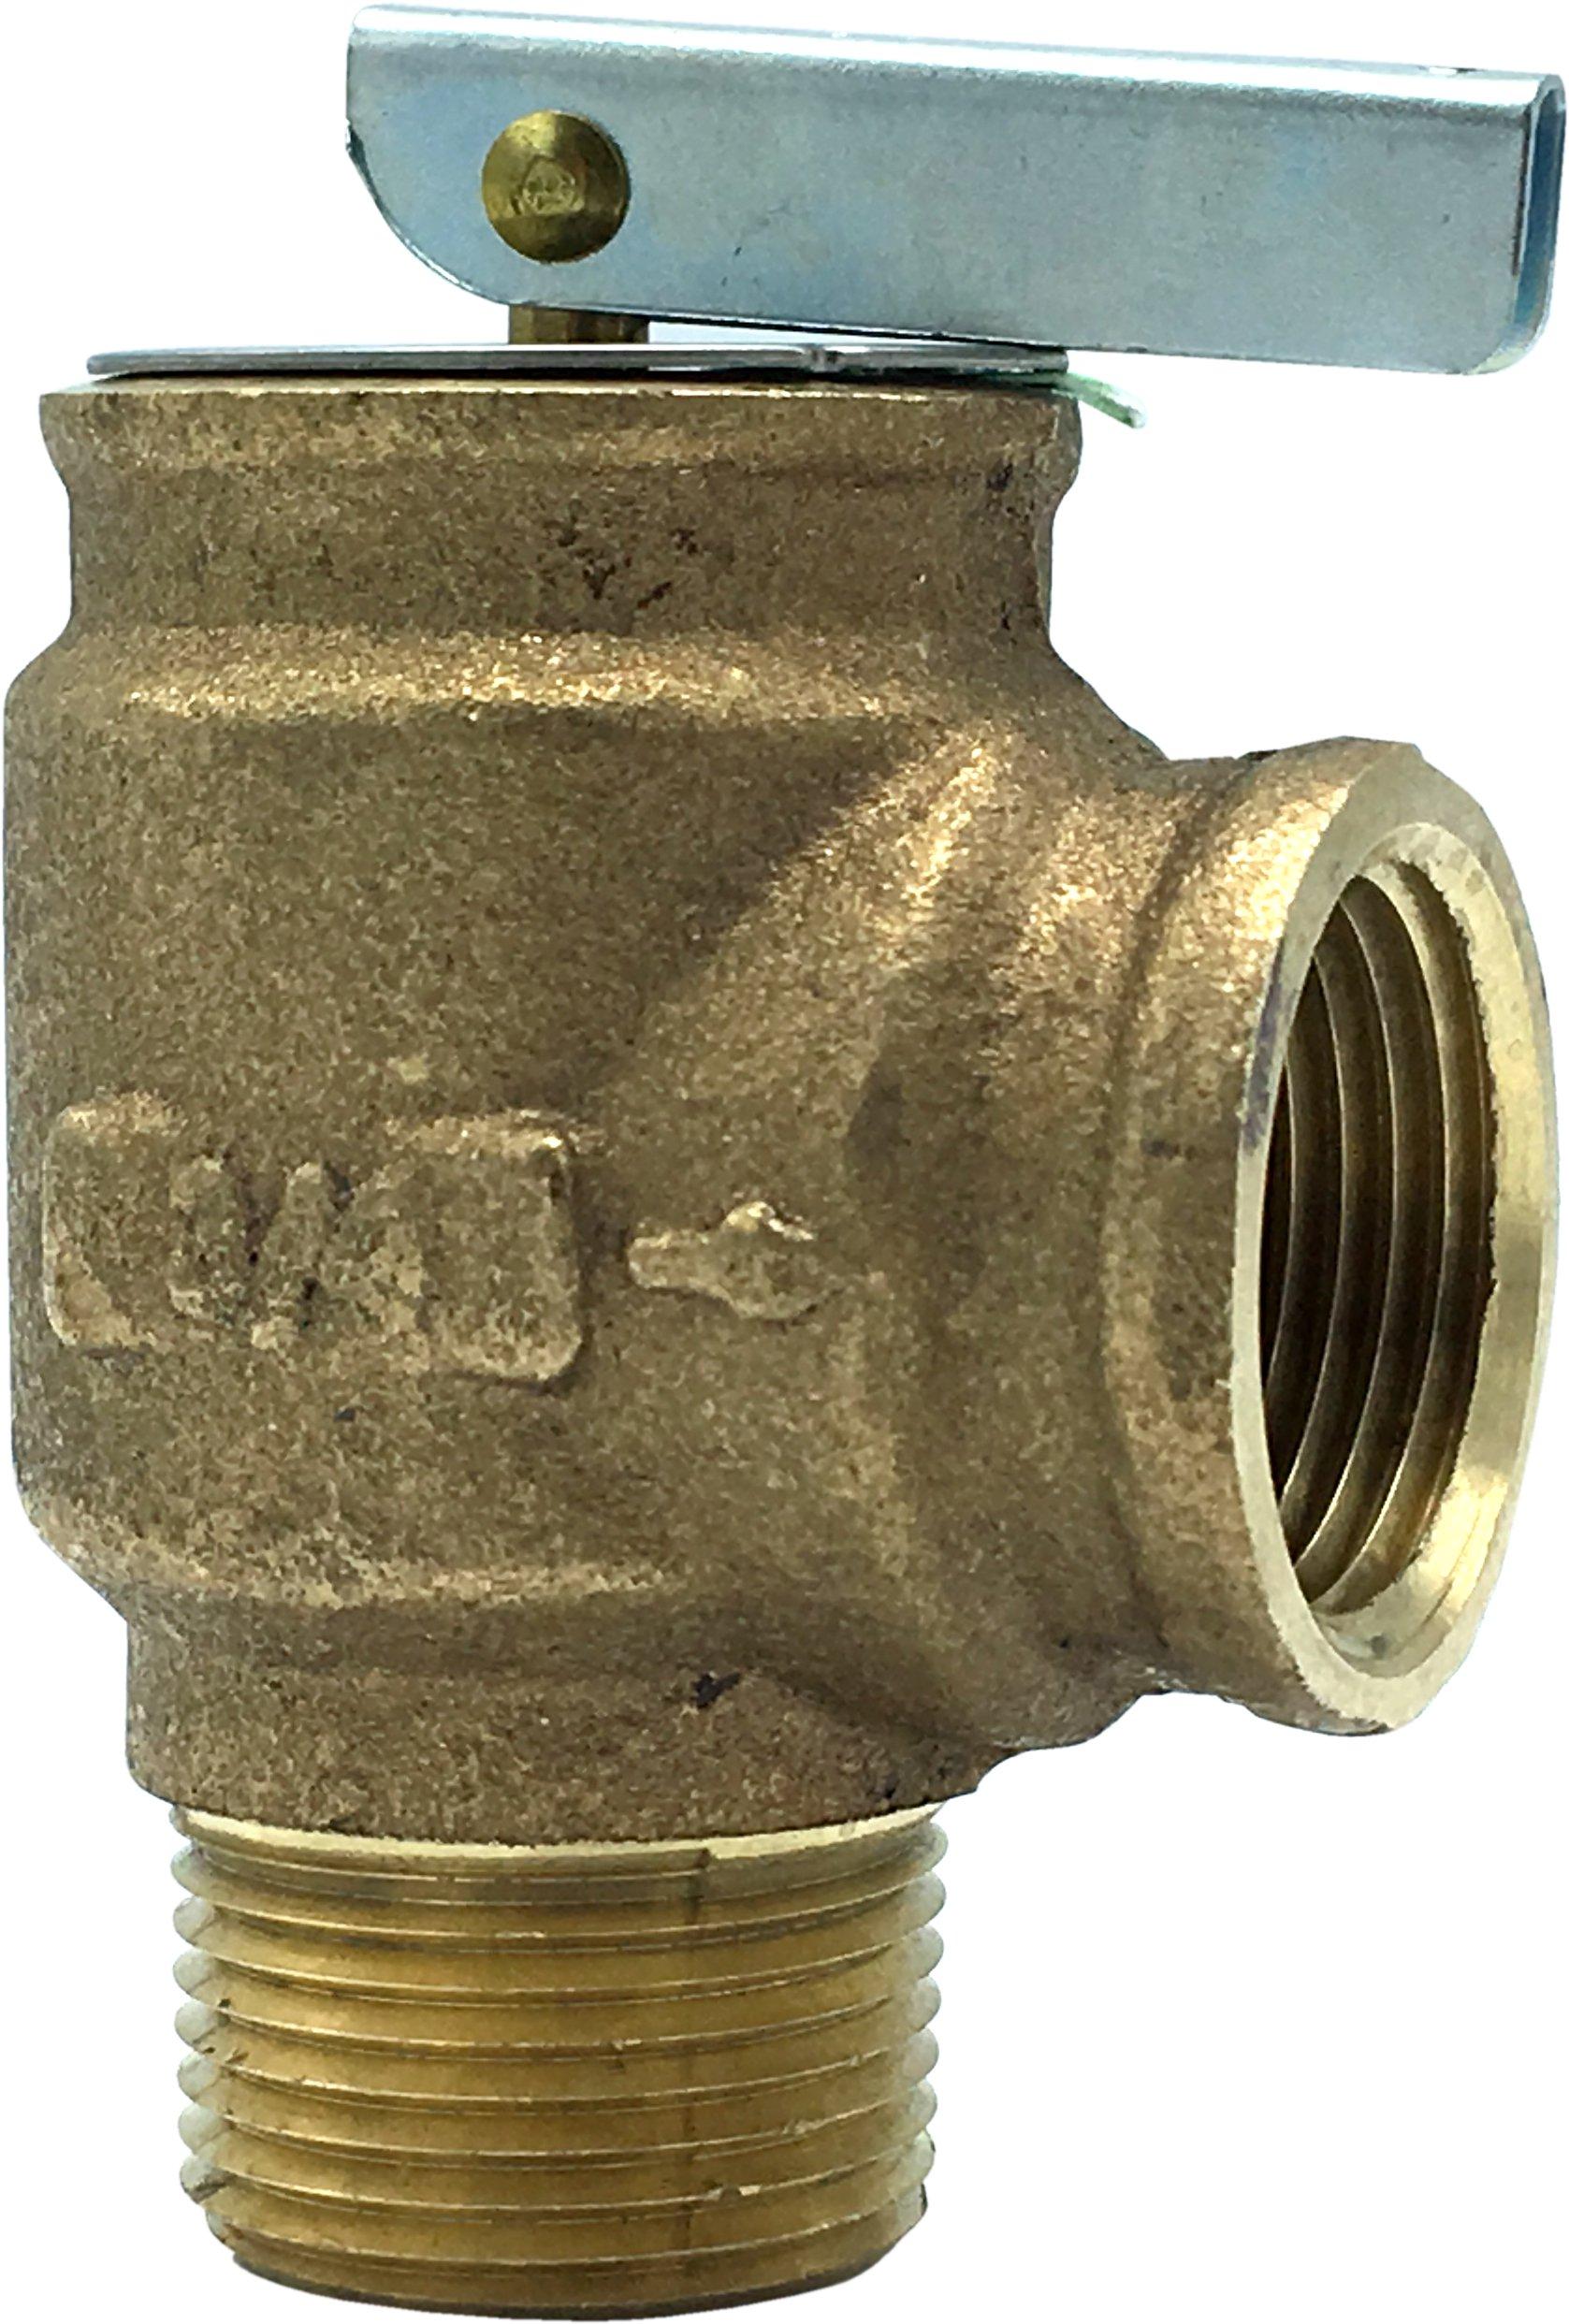 "Walrich 1725006 3/4"" X 3/4"" Mptxfpt 30Psi Boiler Relief Valve"